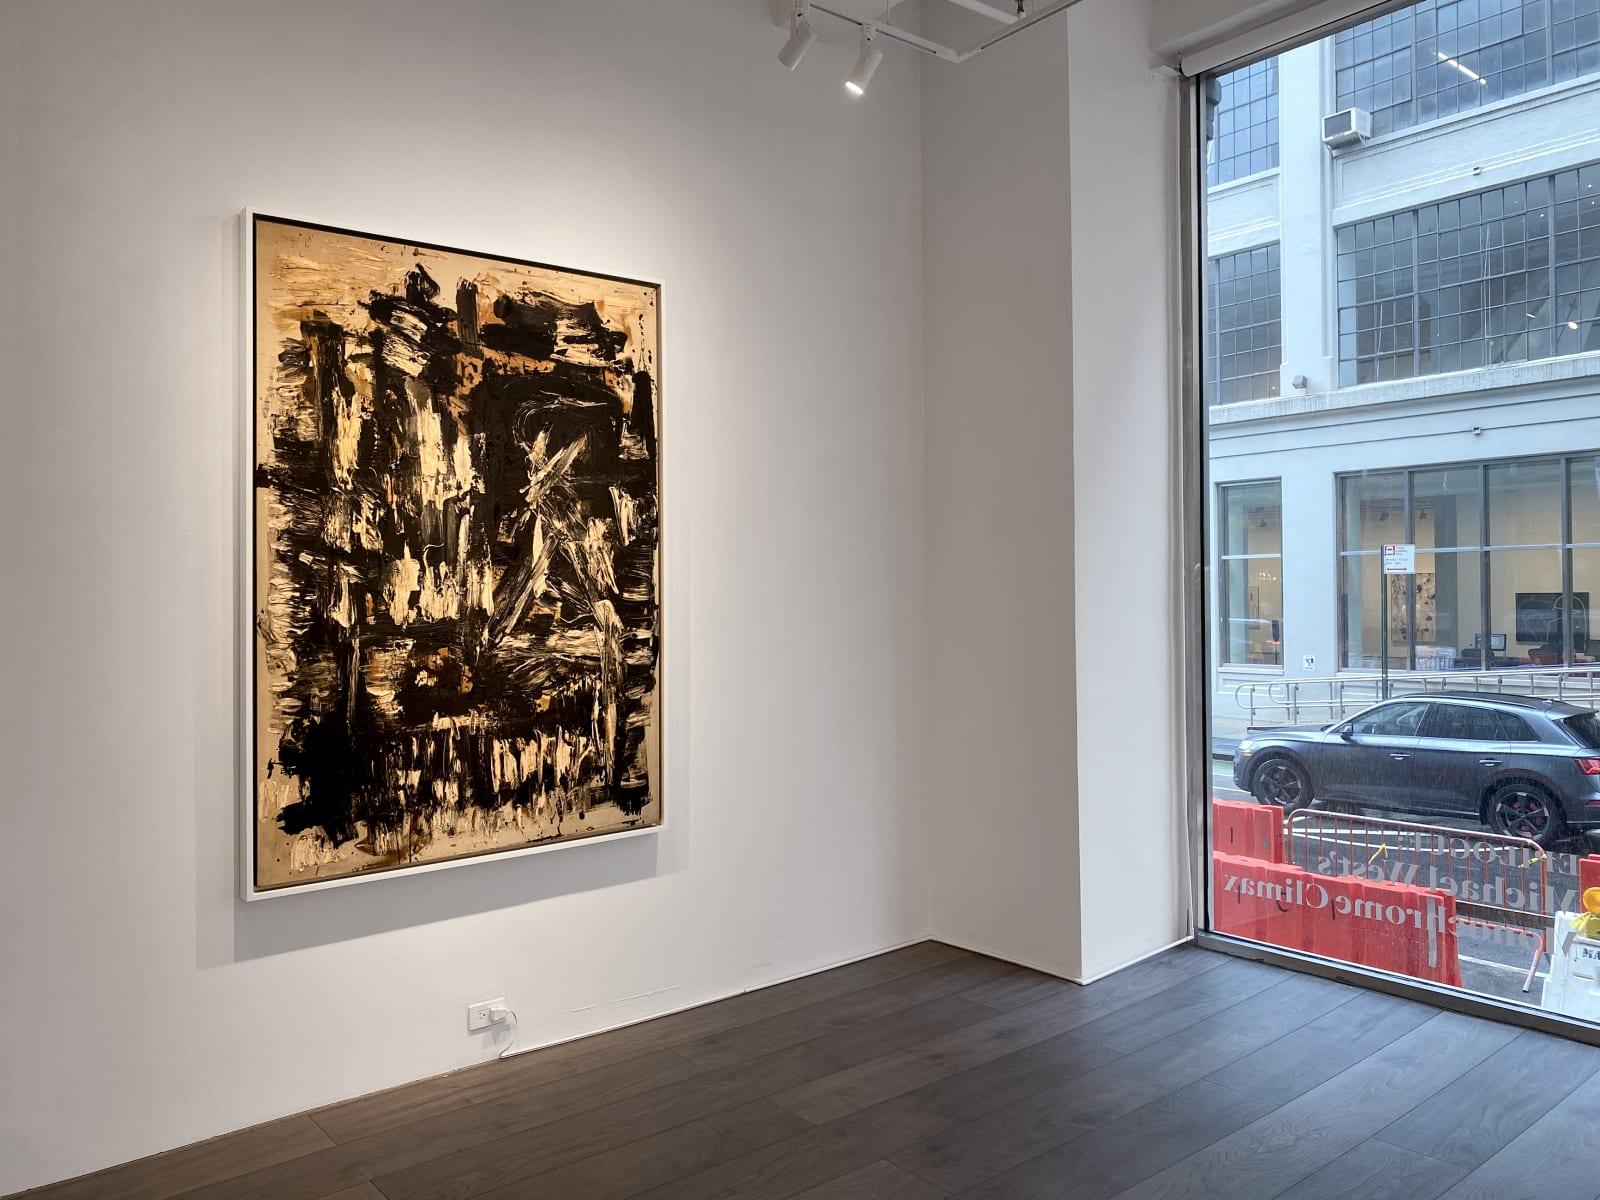 Installation view: Epilogue: Michael West's Monochrome Climax